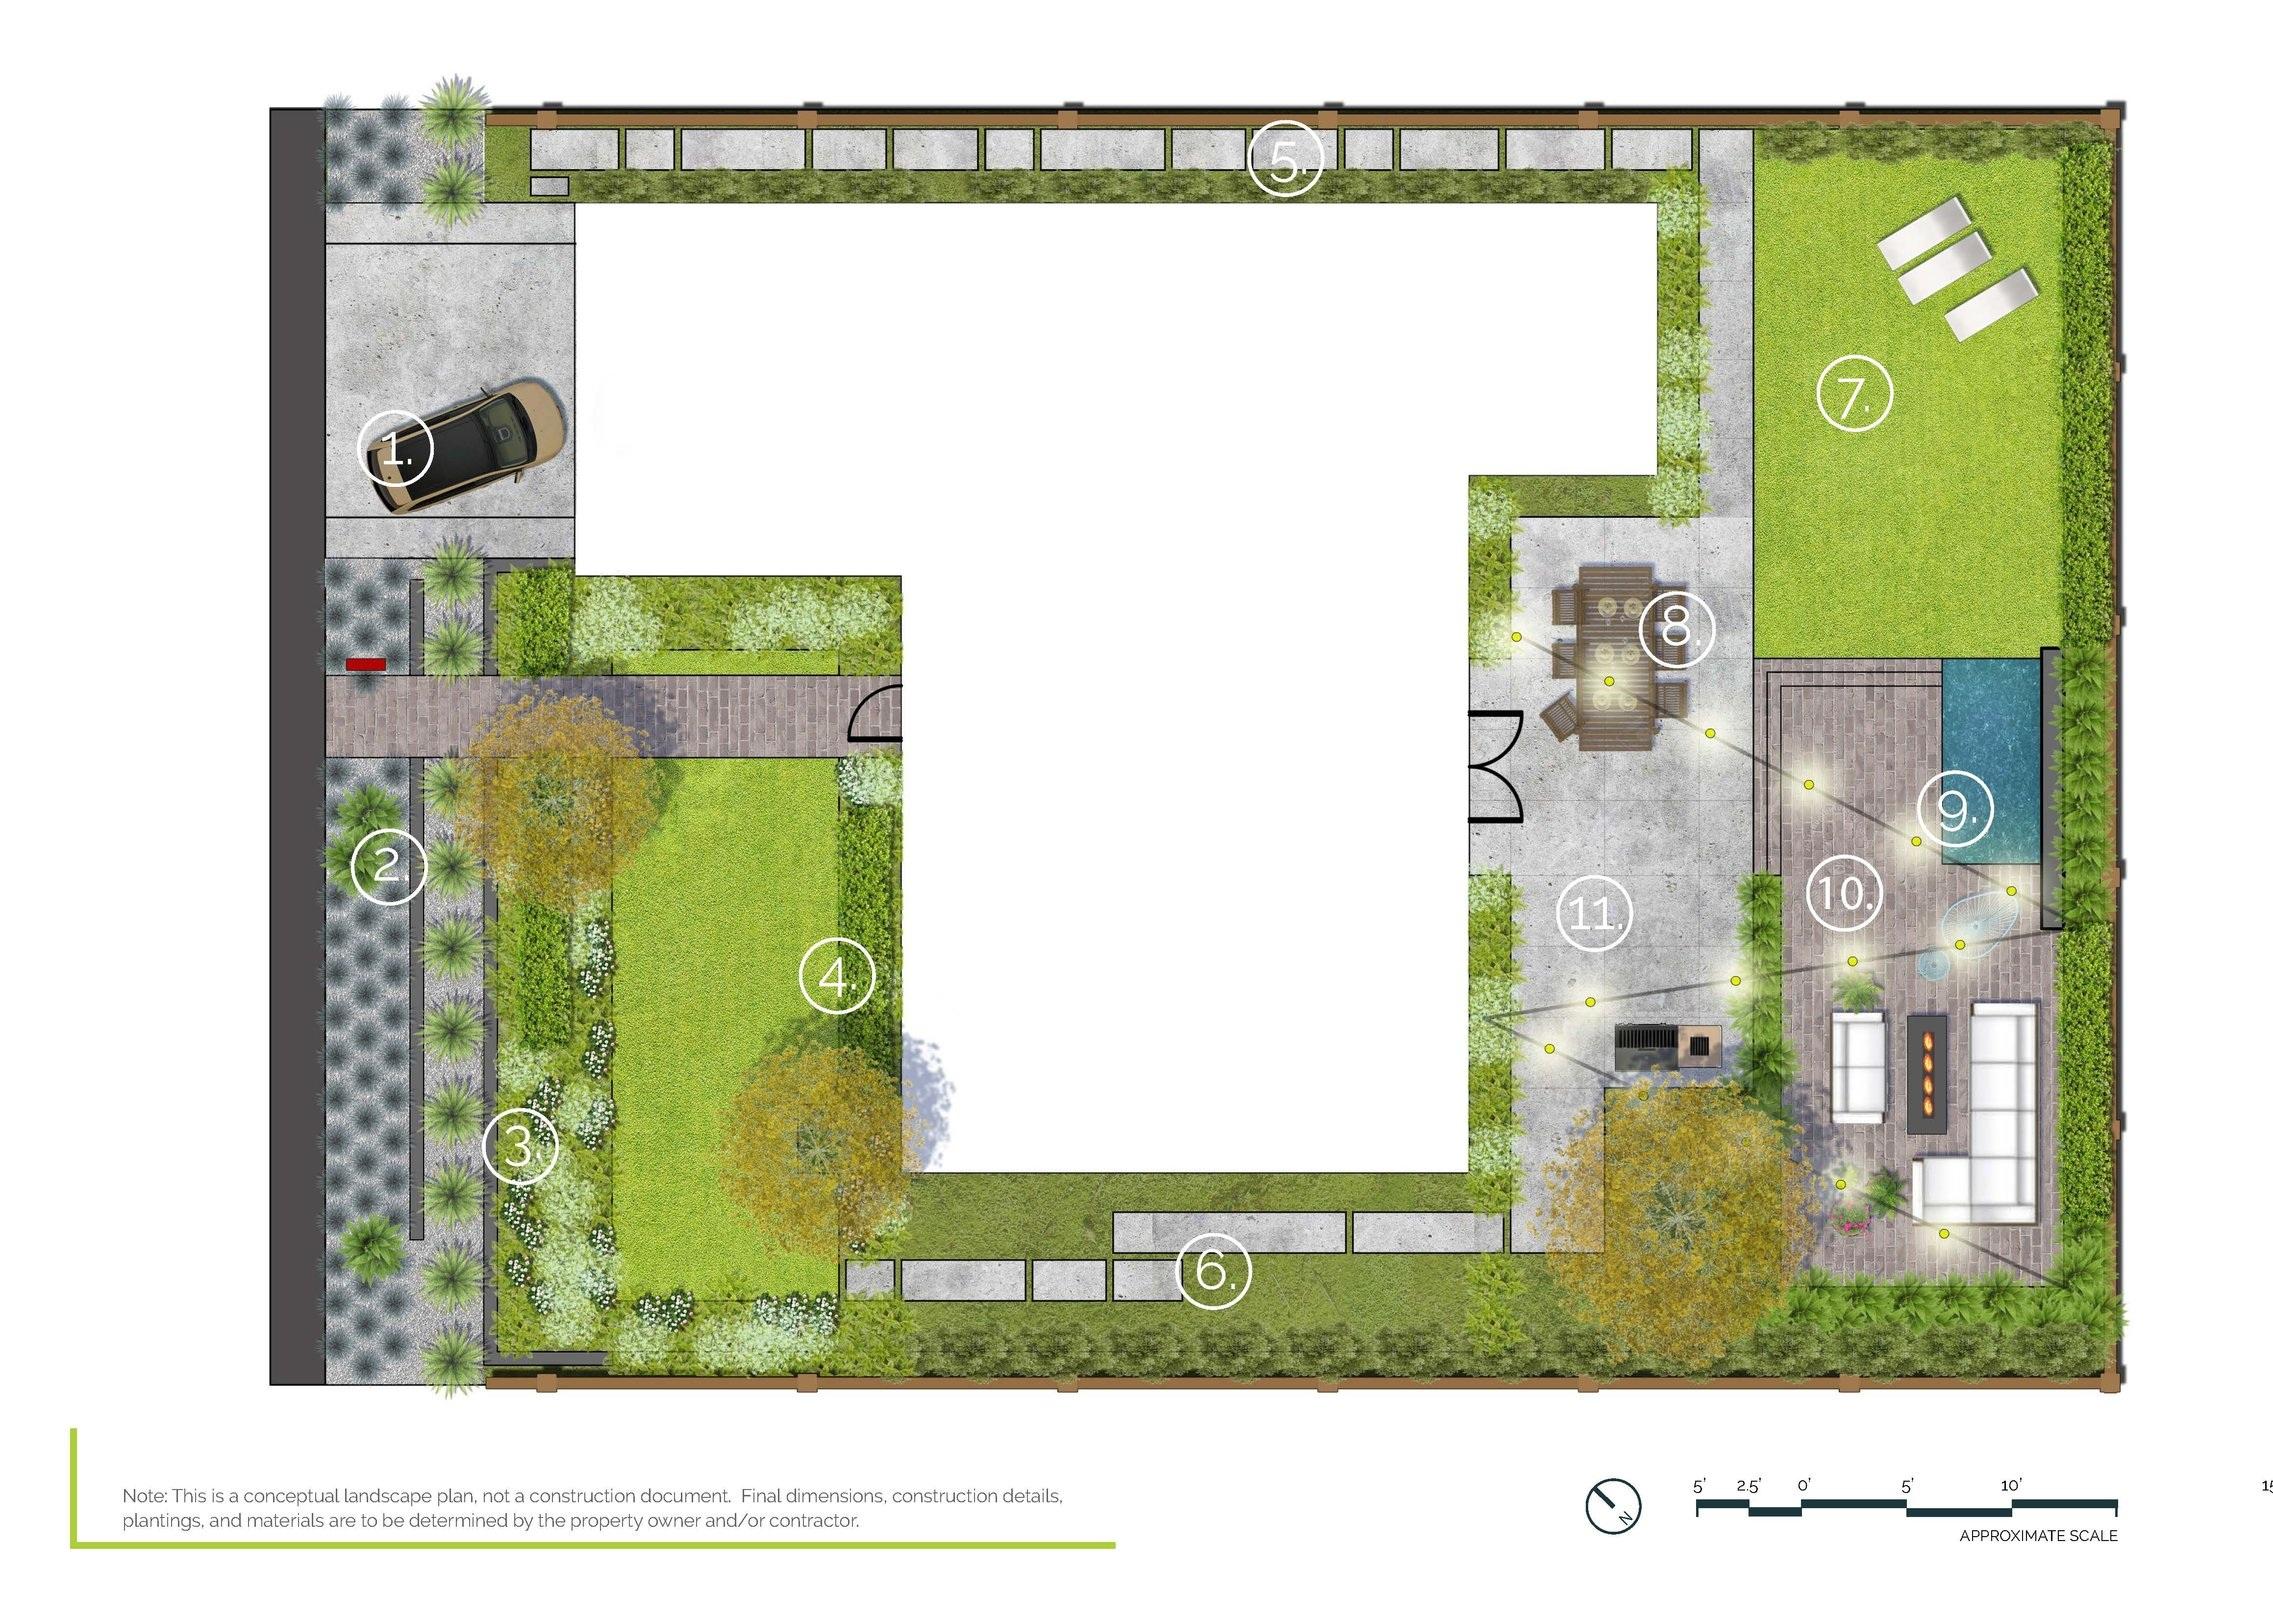 Outdoor Living - Full Property PlanAustin, TX